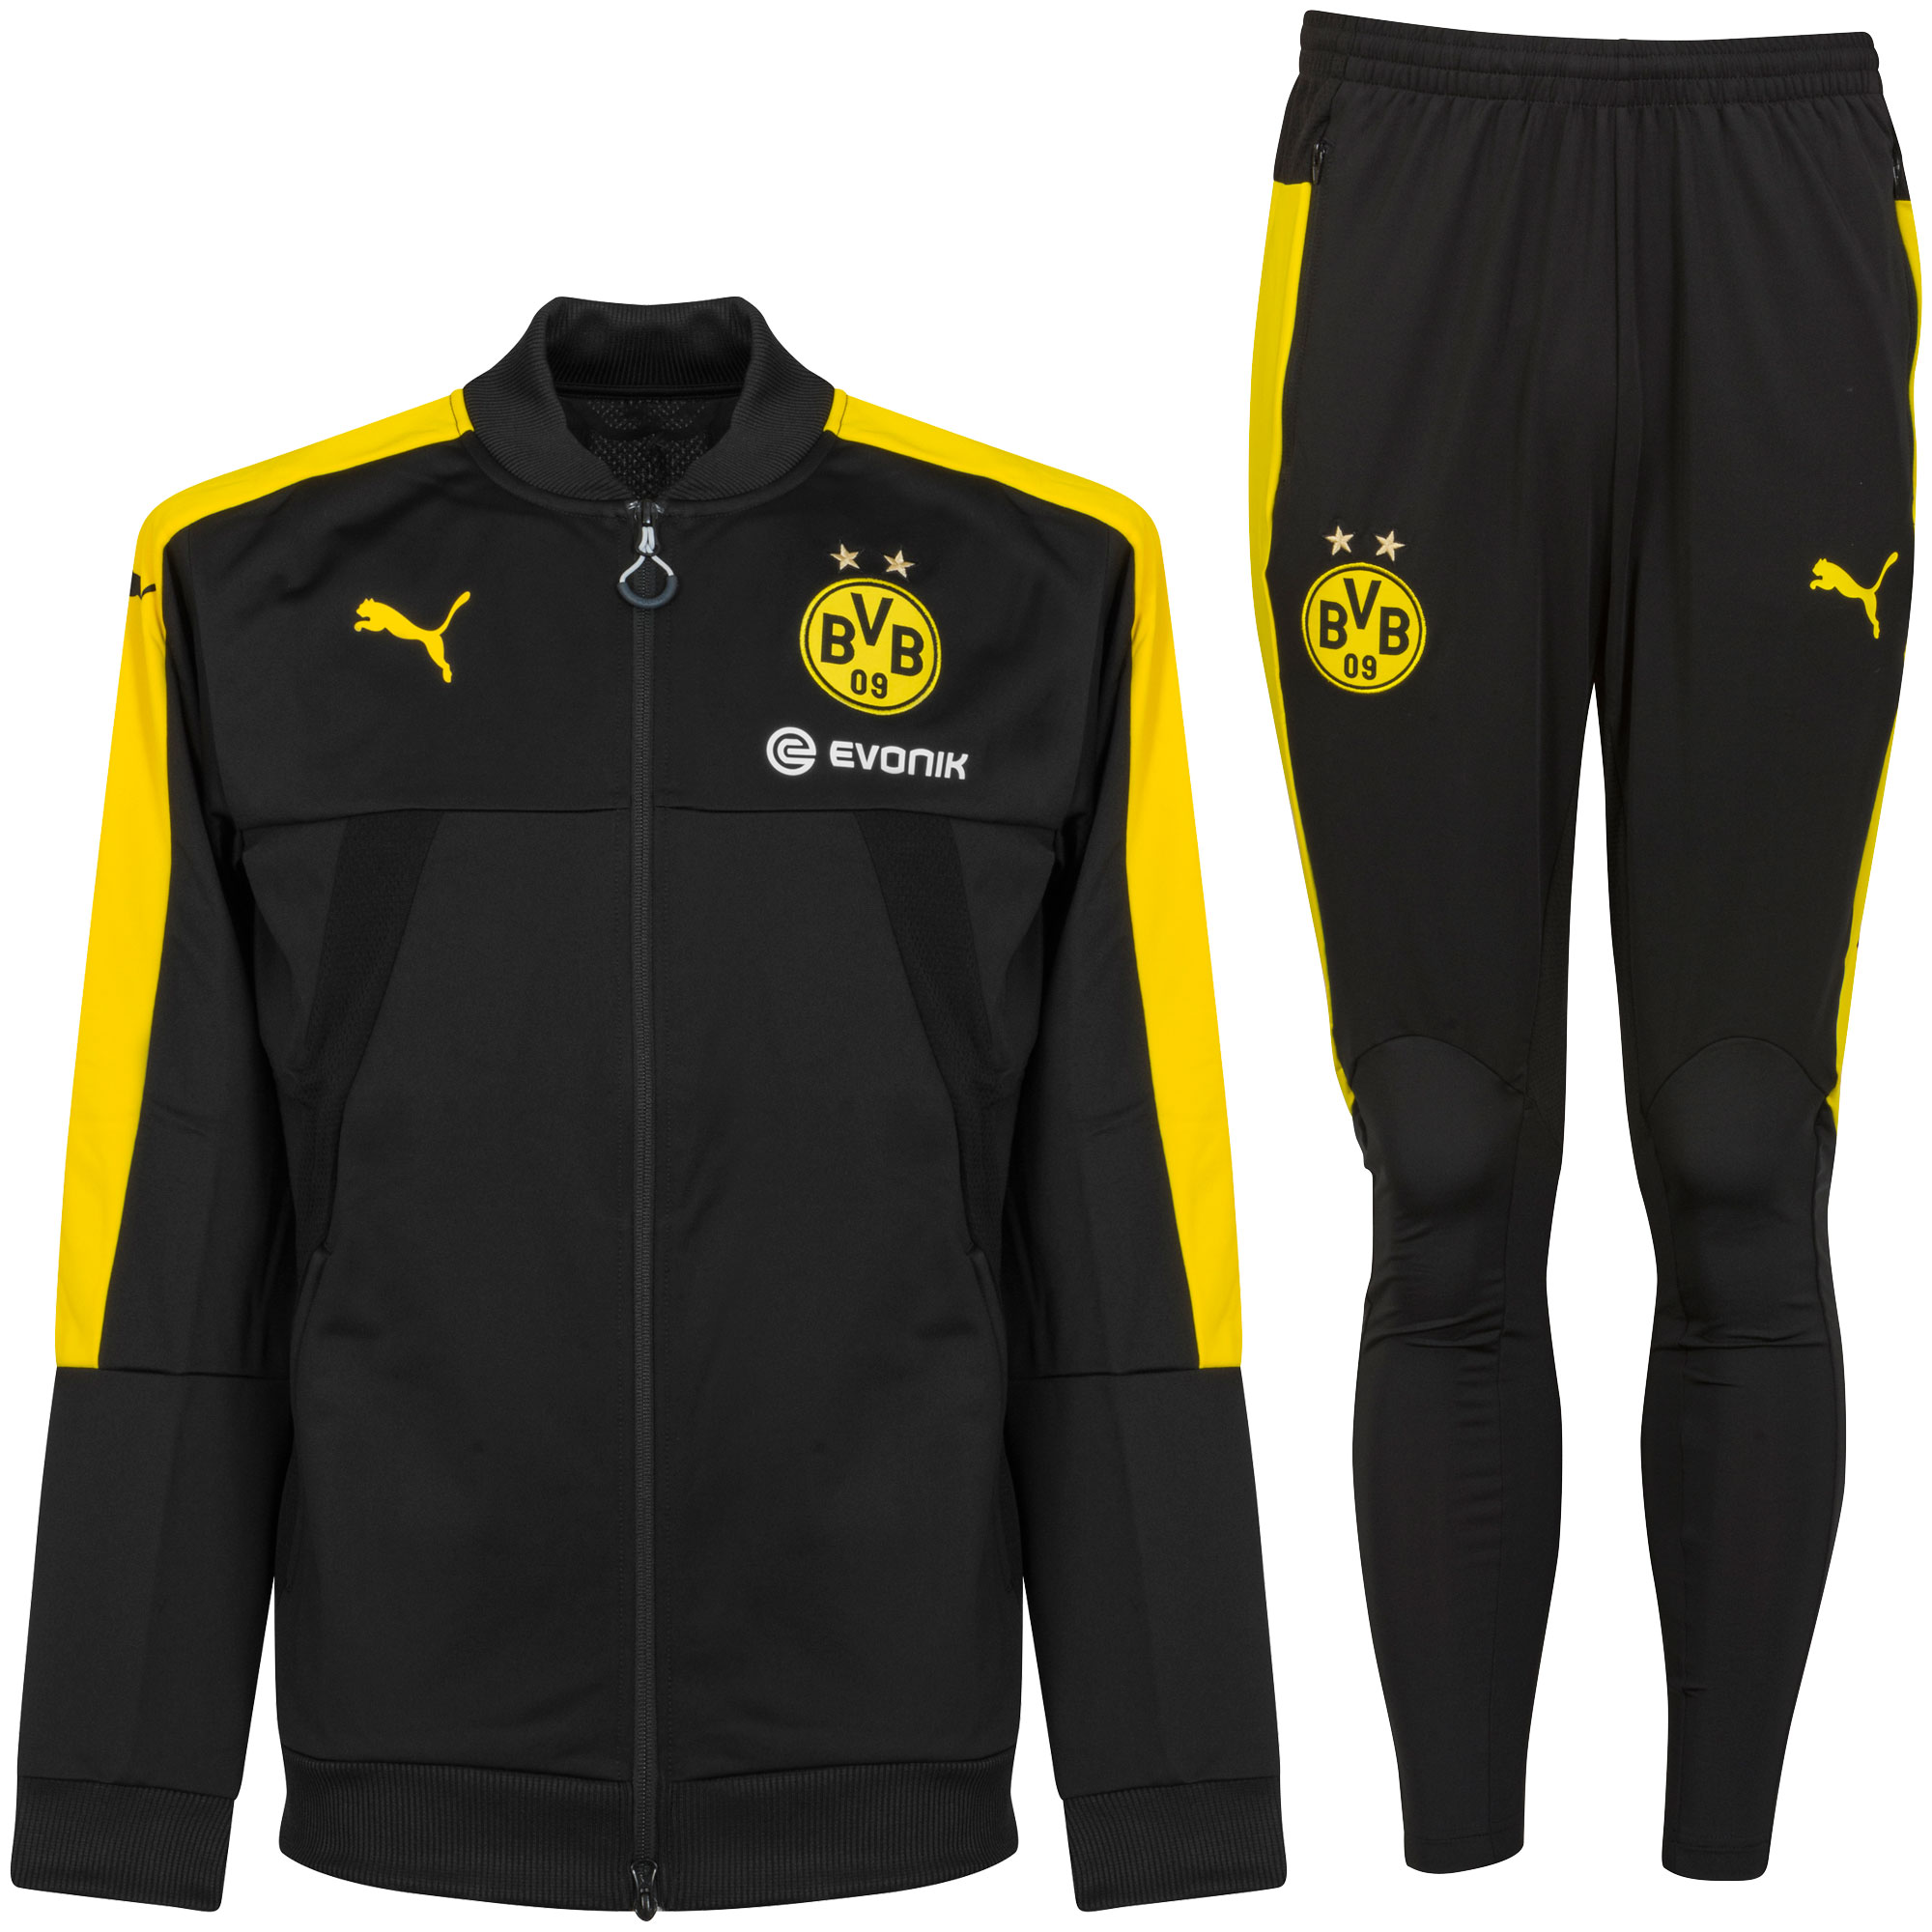 2017 Borussia Dortmund KIDS Training Suit - Black - 176